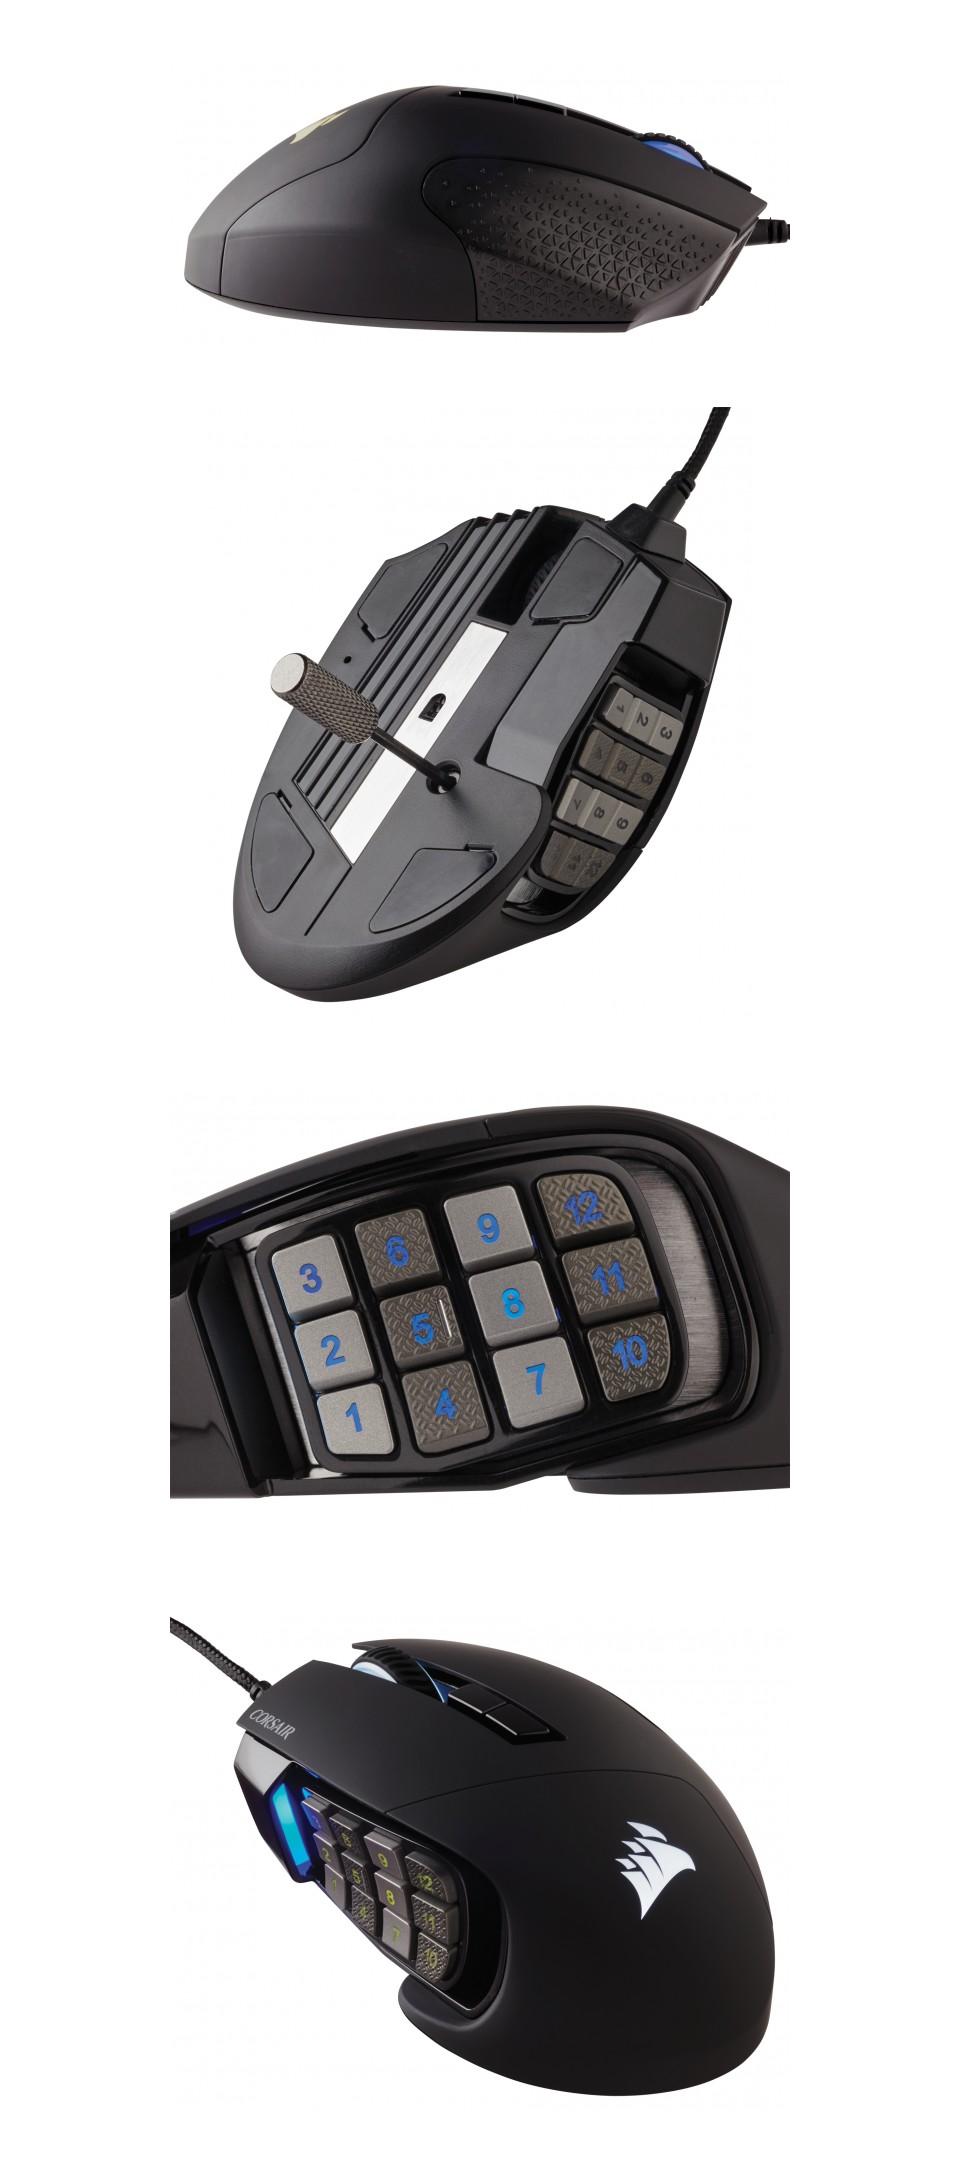 Corsair Scimitar Elite RGB Optical Gaming Mouse product